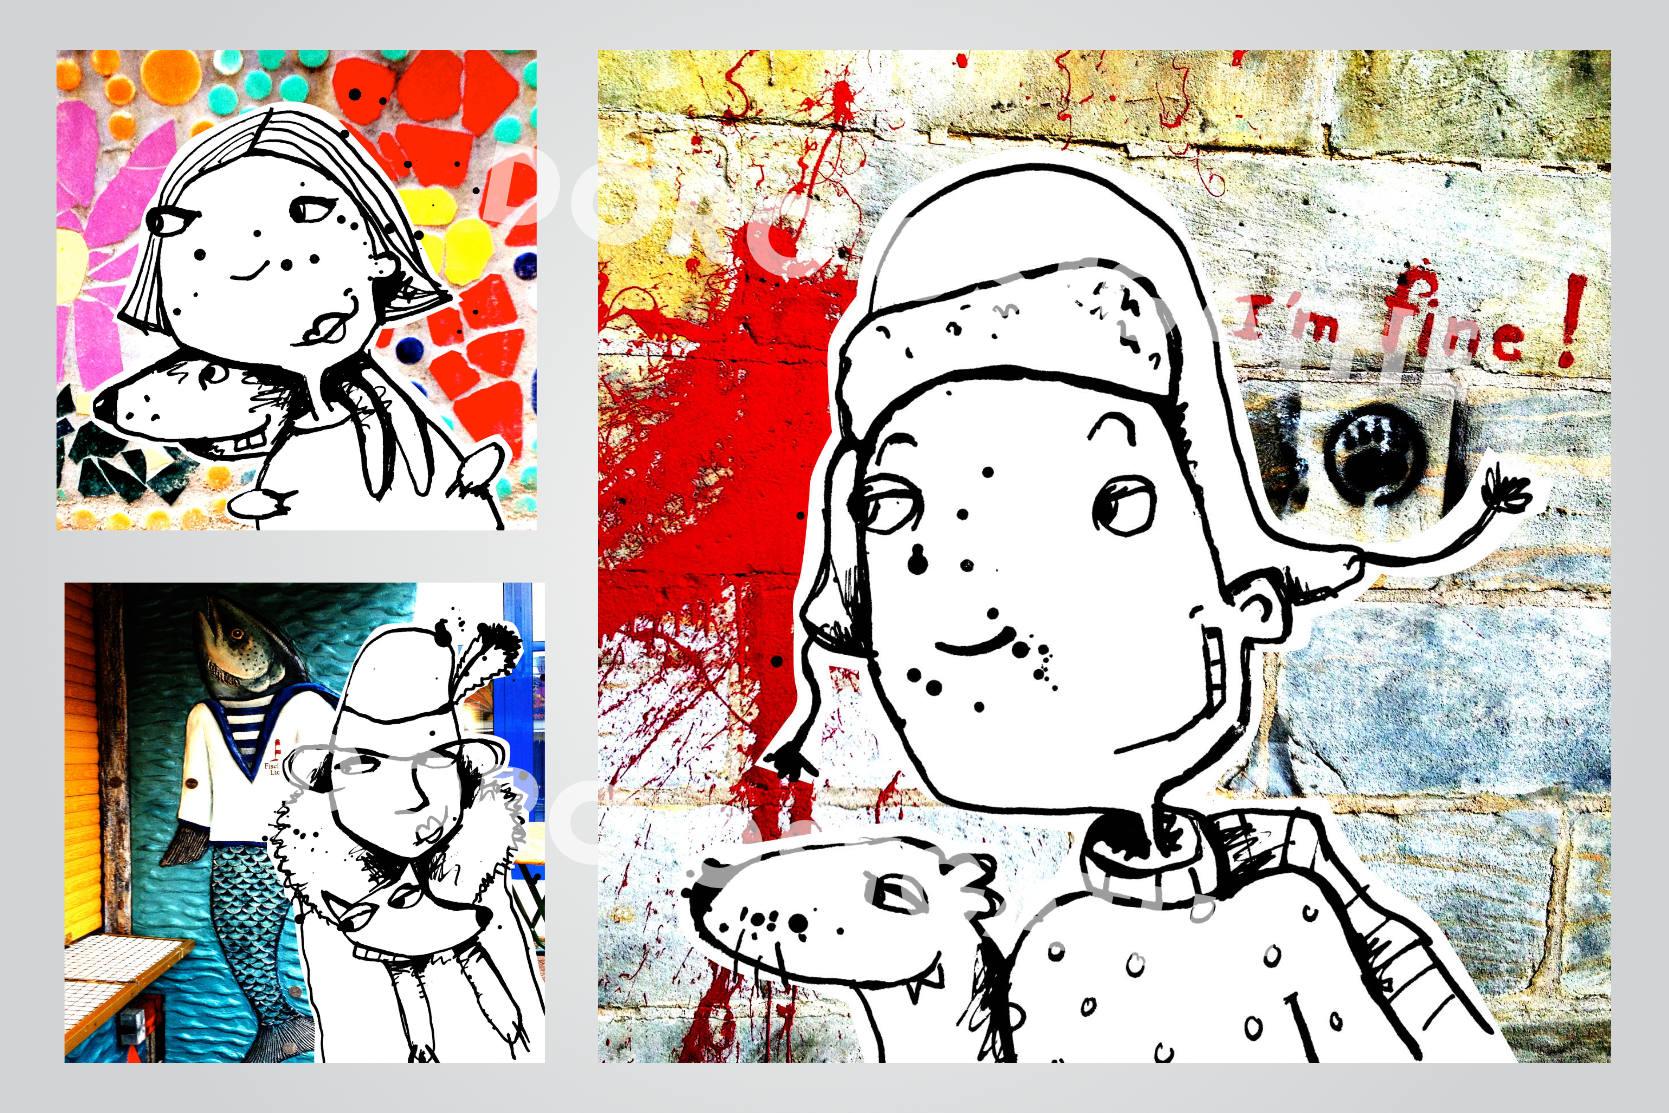 illustration-kunst-art-ostgathe-11.jpg